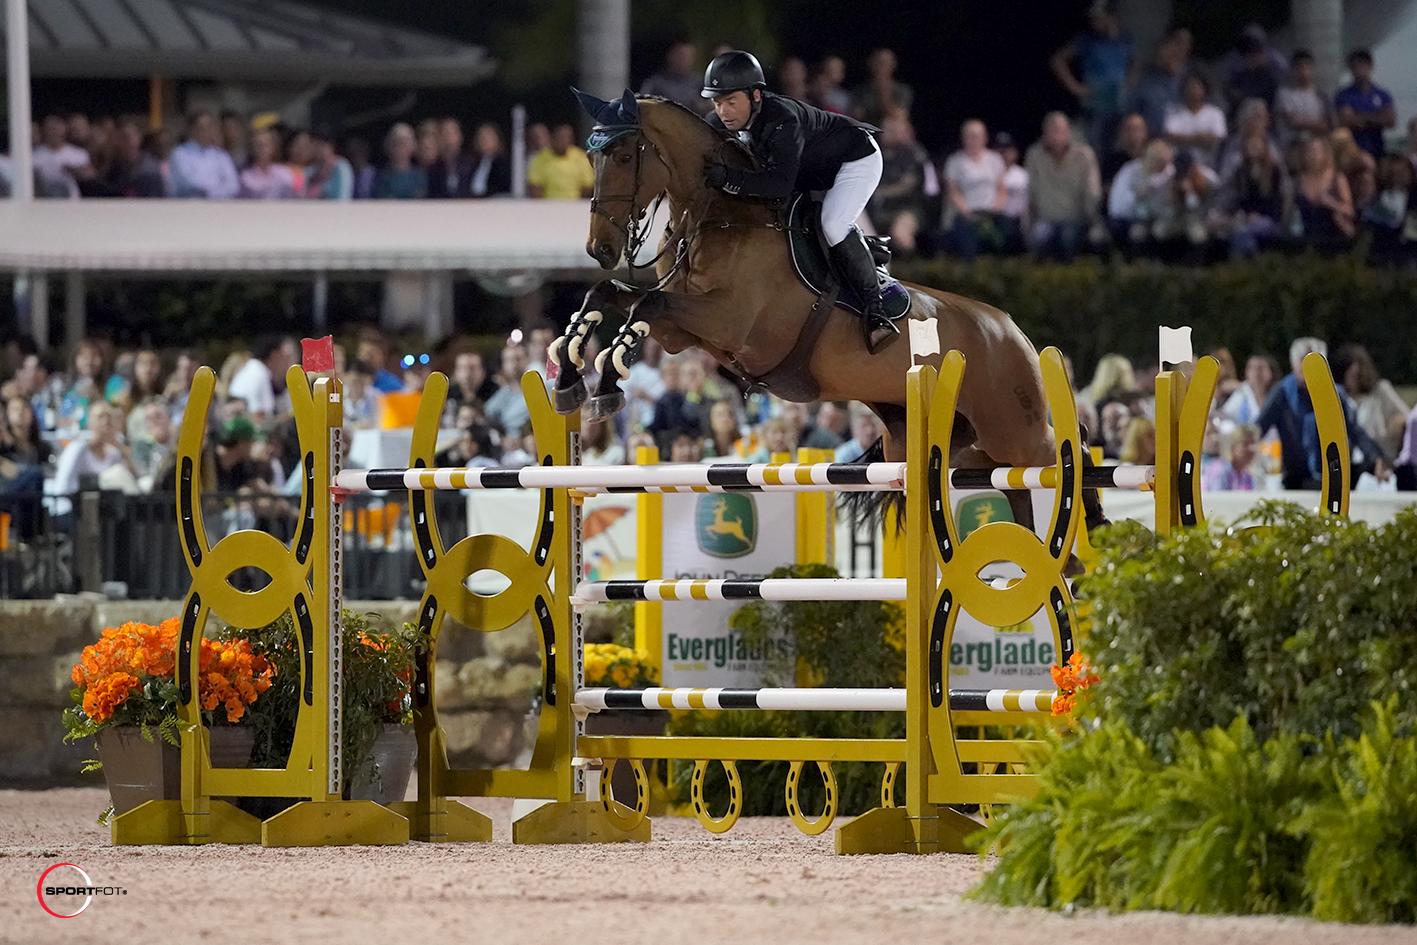 Cian O'Connor and Clenur 30606297 Sportfot